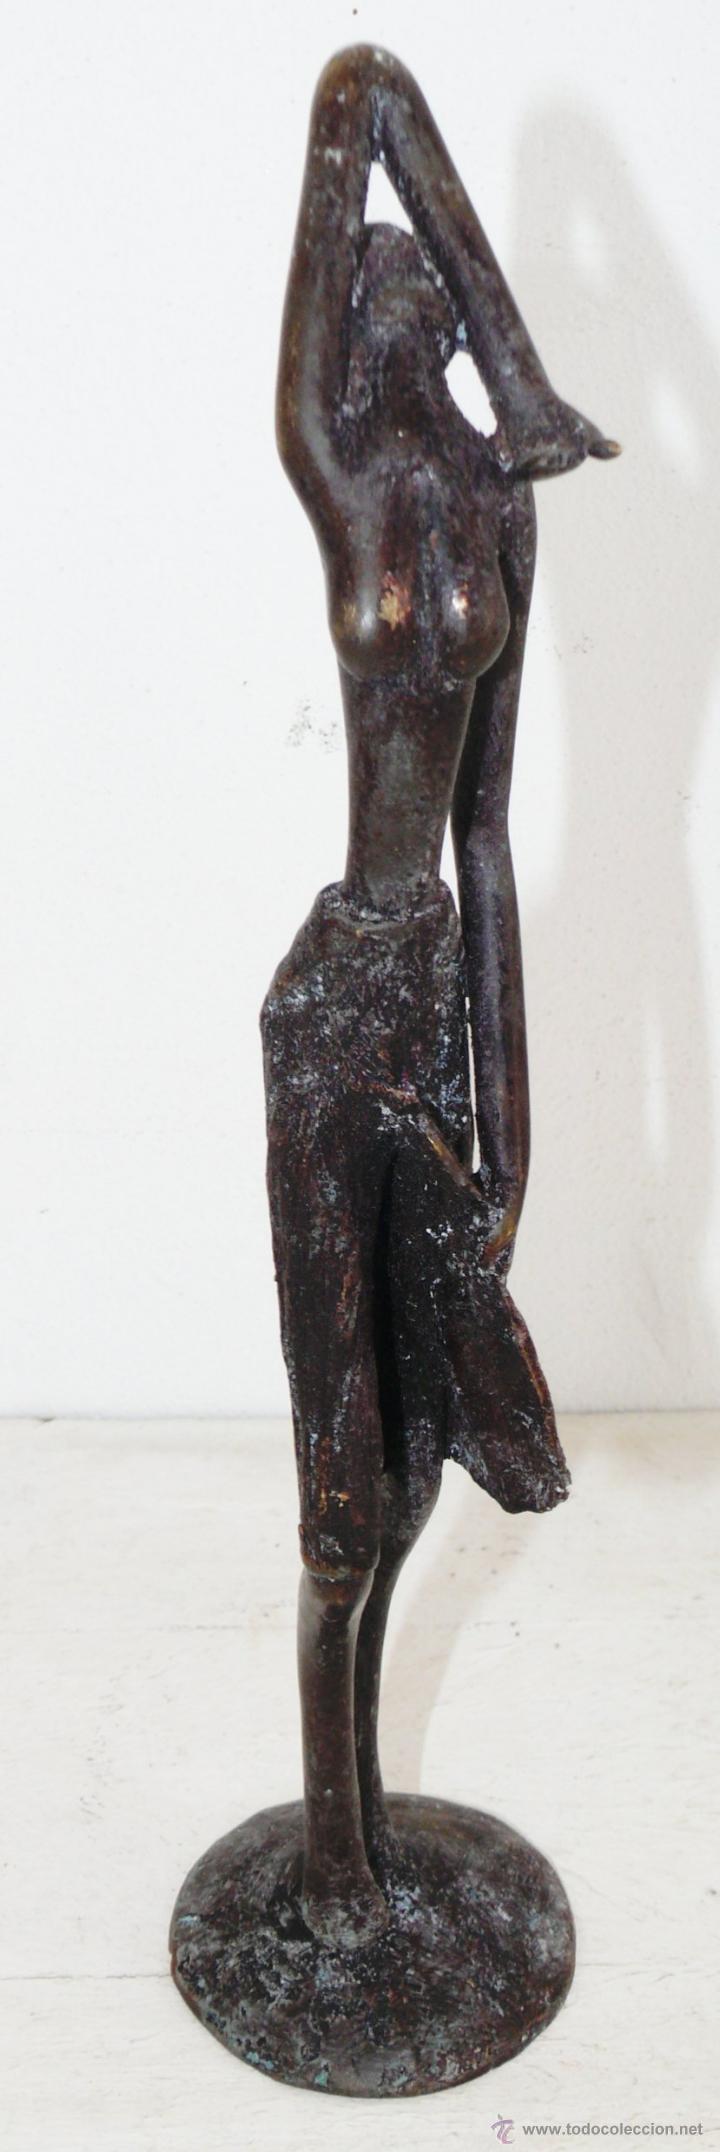 Arte: FANTASTICA ESCULTURA EN BRONCE MUJER AFRICANA - Foto 7 - 44877644